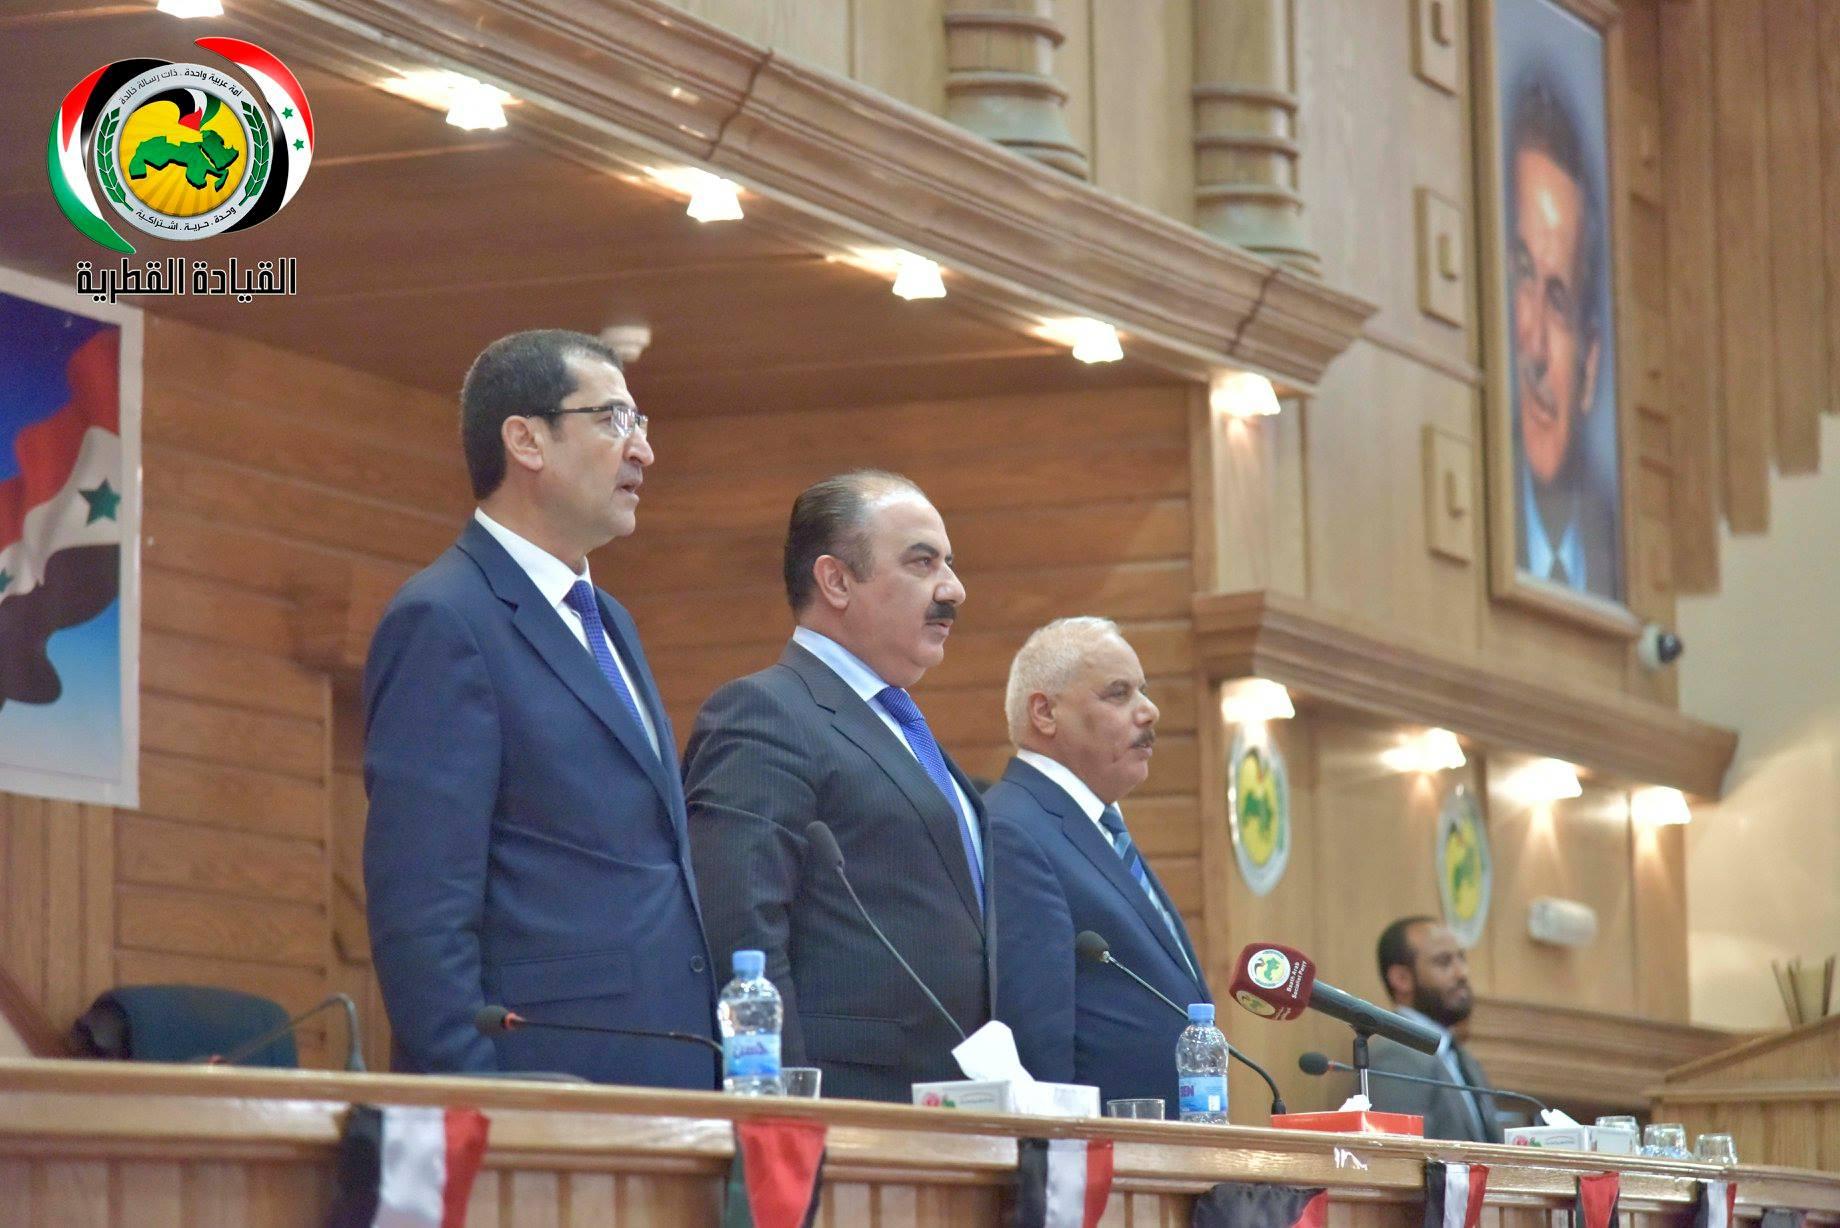 Eng. Hilal al-Hilal, Assistant Regional Secretary of al-Baath Arab Socialist Party (the party's Facebook page)